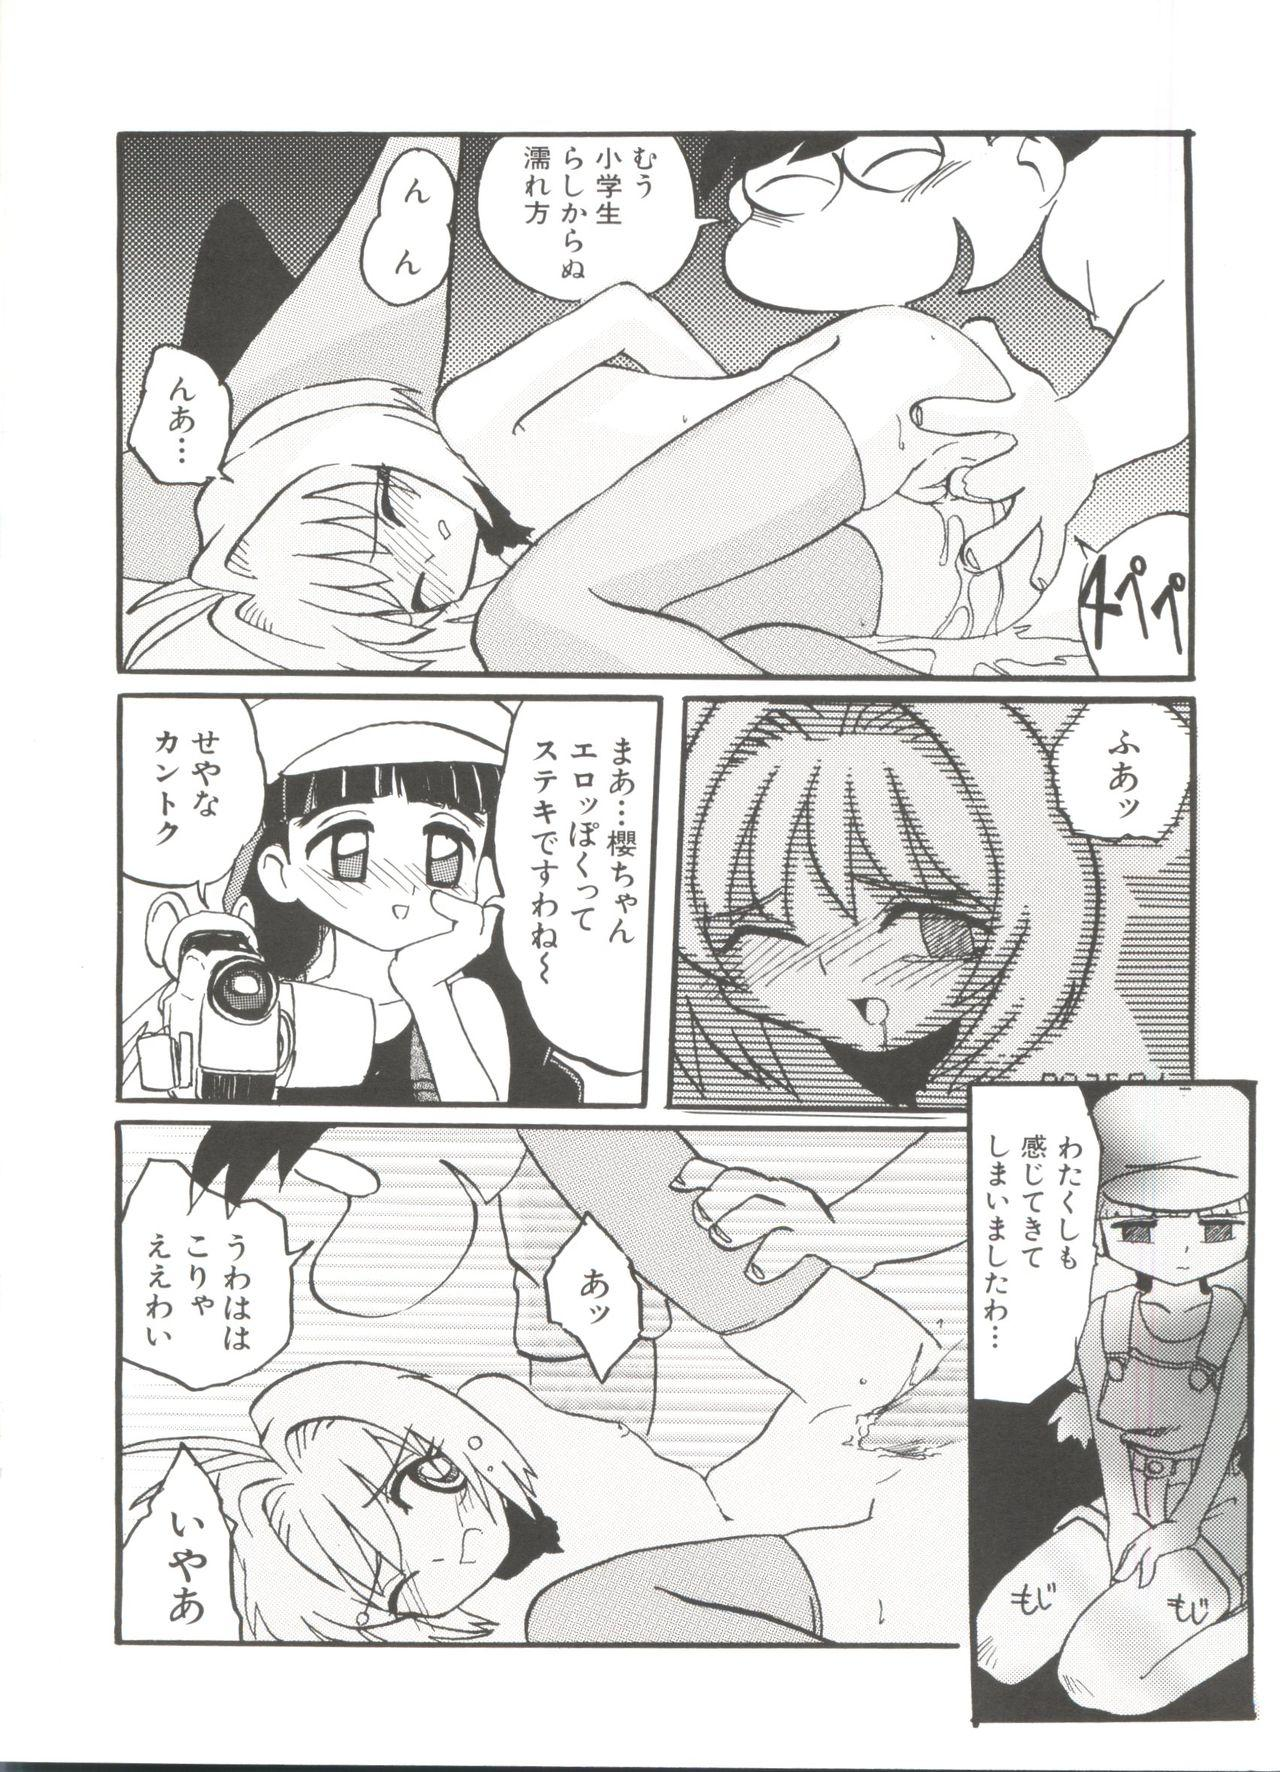 [Anthology] Denei Tamatebako 8 - Utakata no Tenshi-tachi II (Various) 127